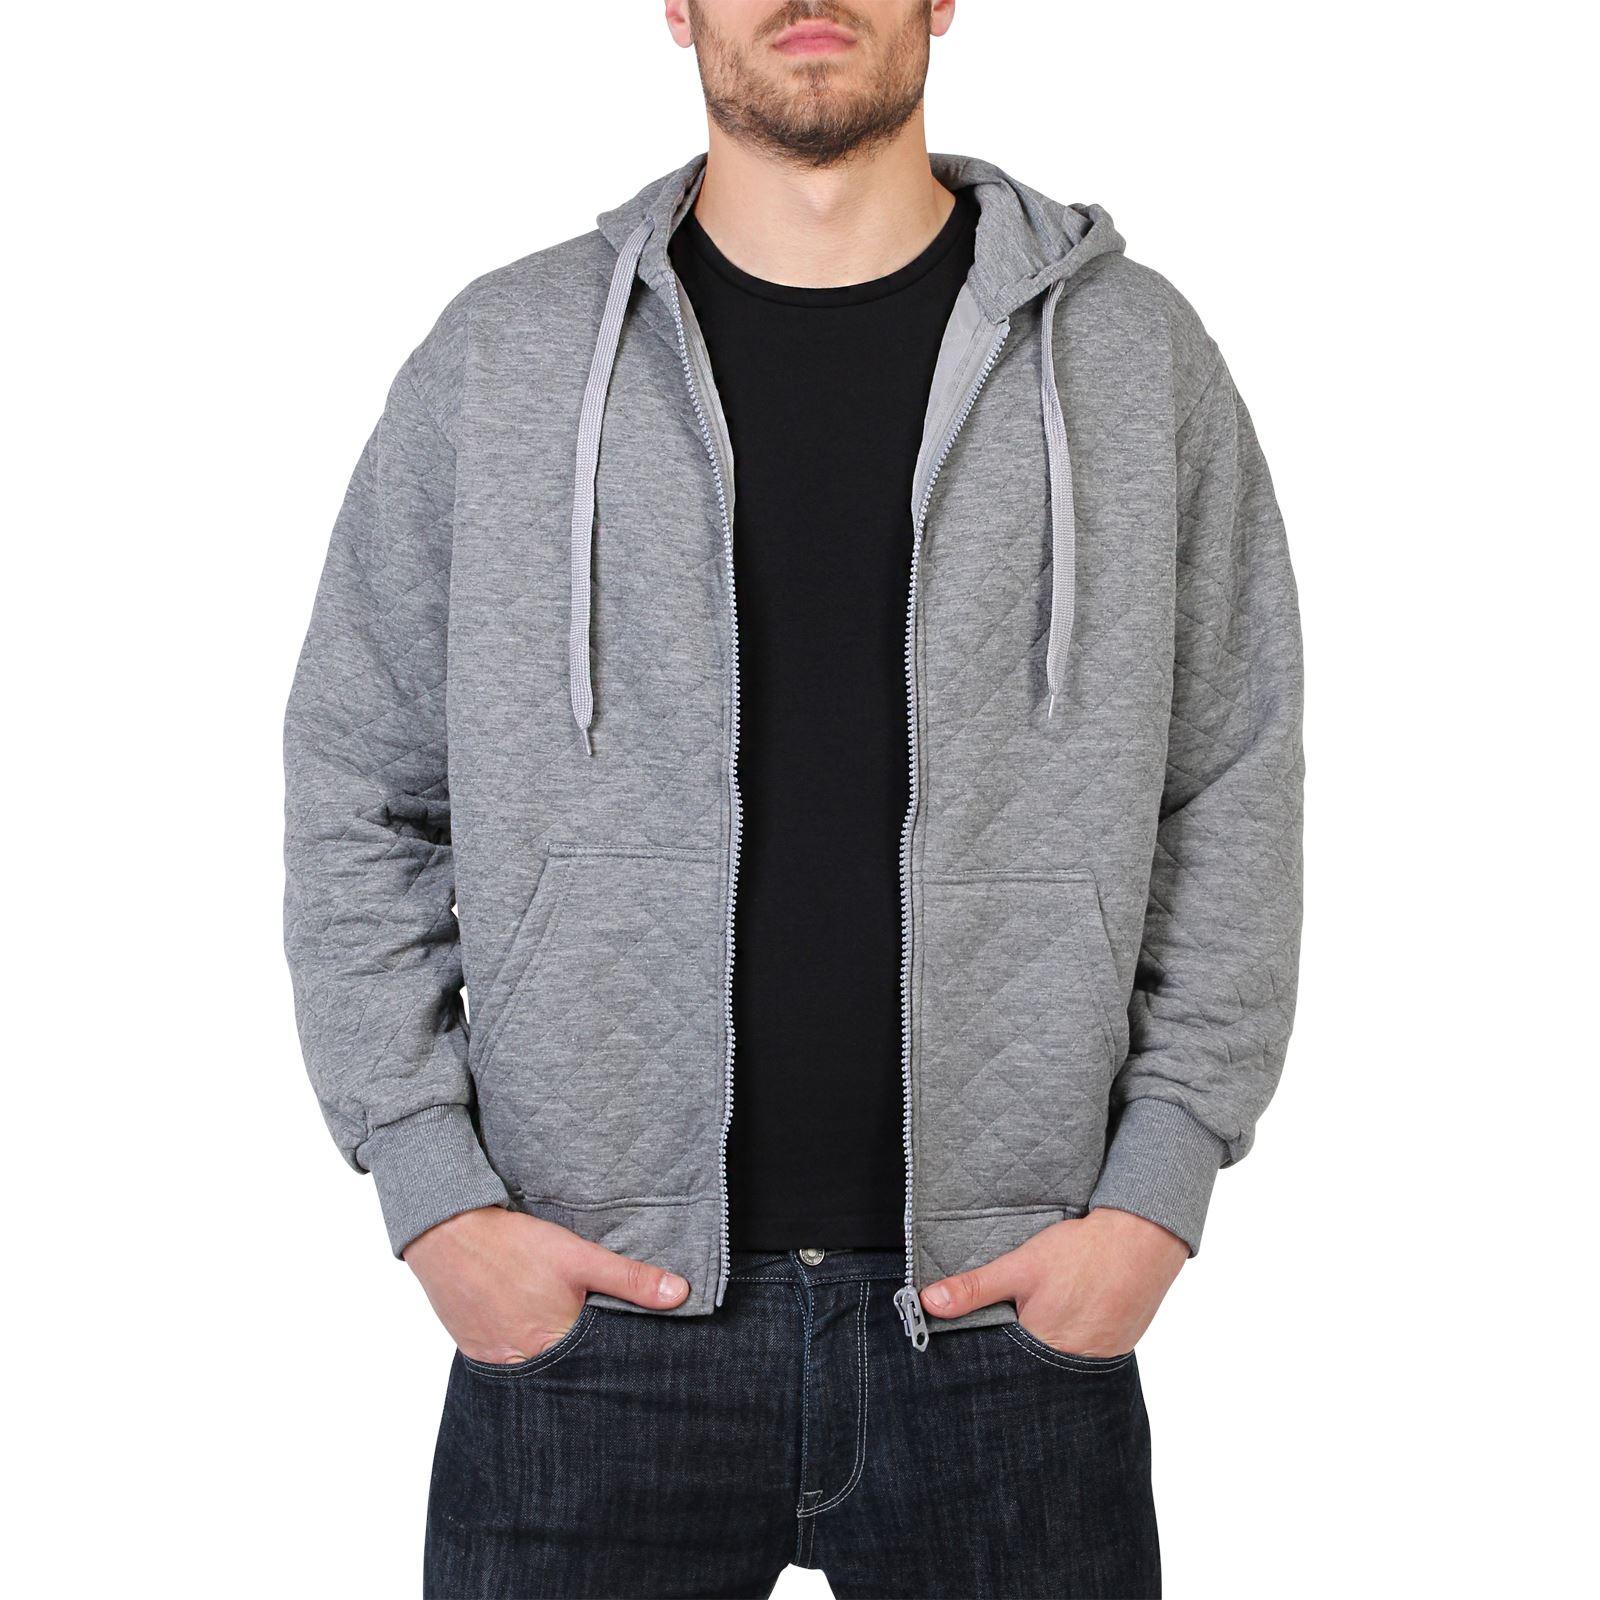 Mens Zip Up Casual Hoodie Plain Classic Cotton Sweatshirt ...